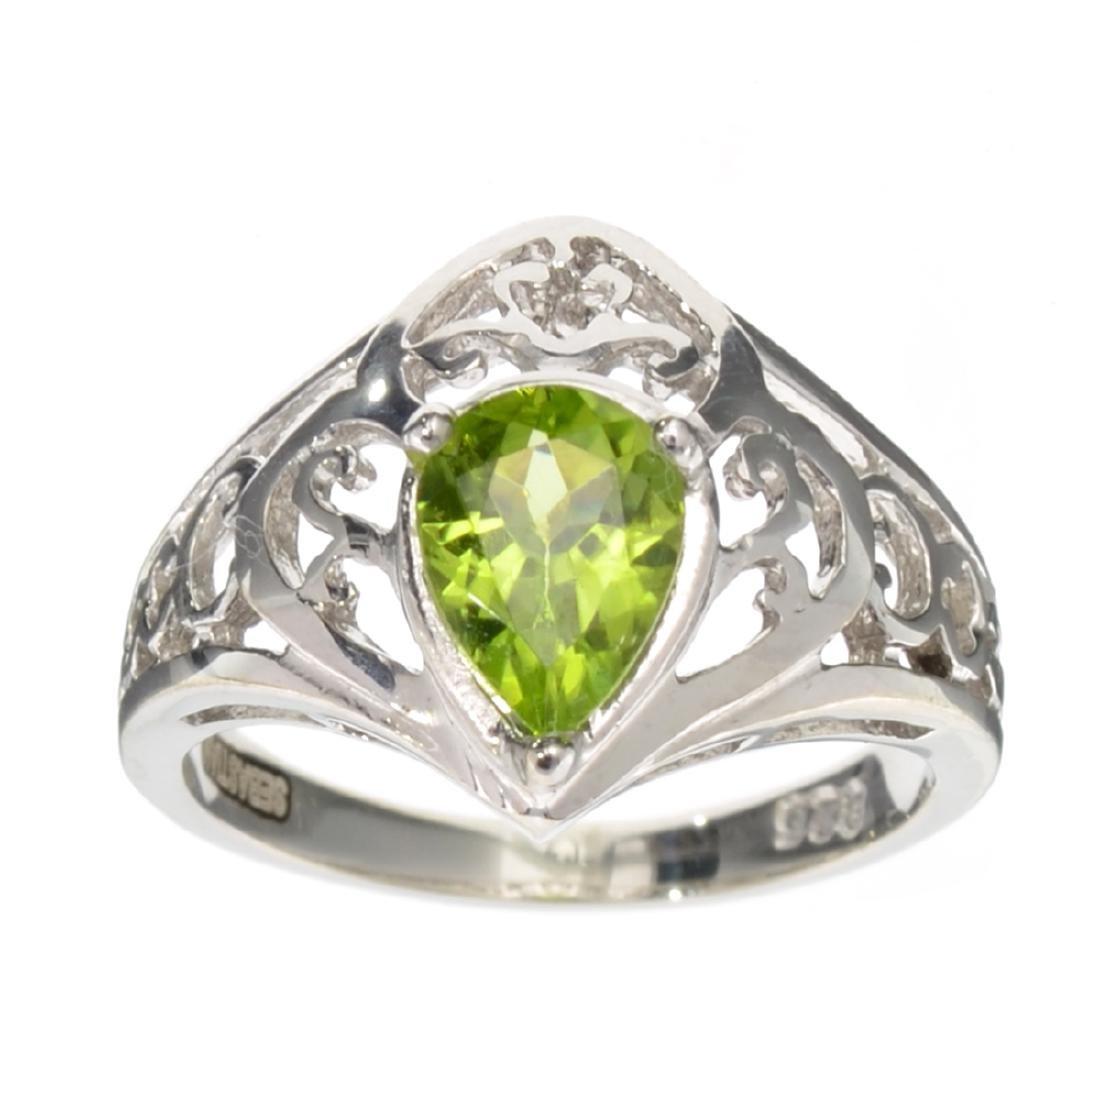 APP: 0.5k Fine Jewelry Designer Sebastian, Pear Cut